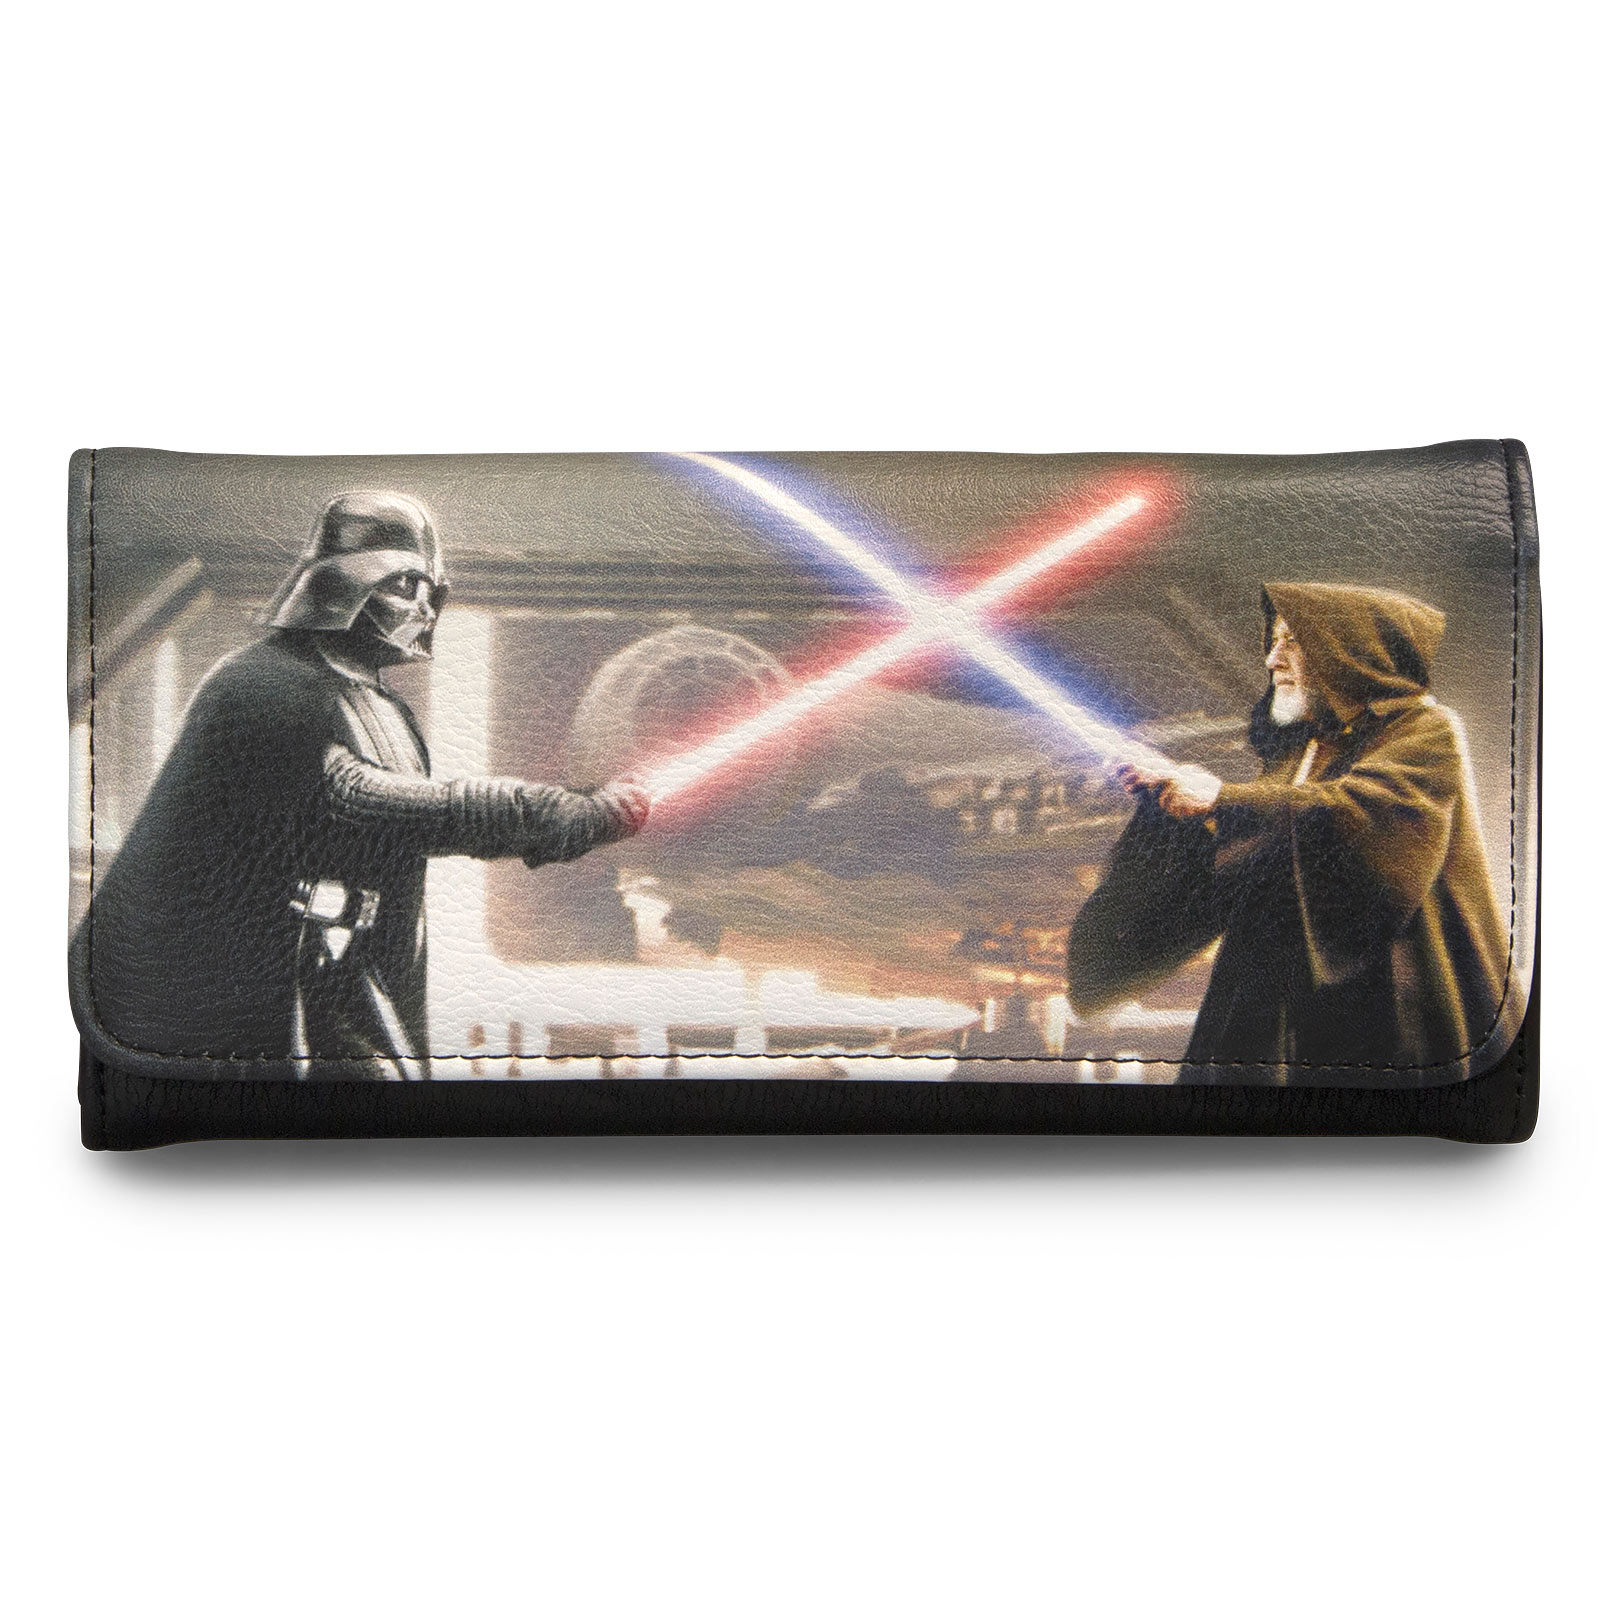 Star Wars - Darth Vader & Obi Wan Geldbörse